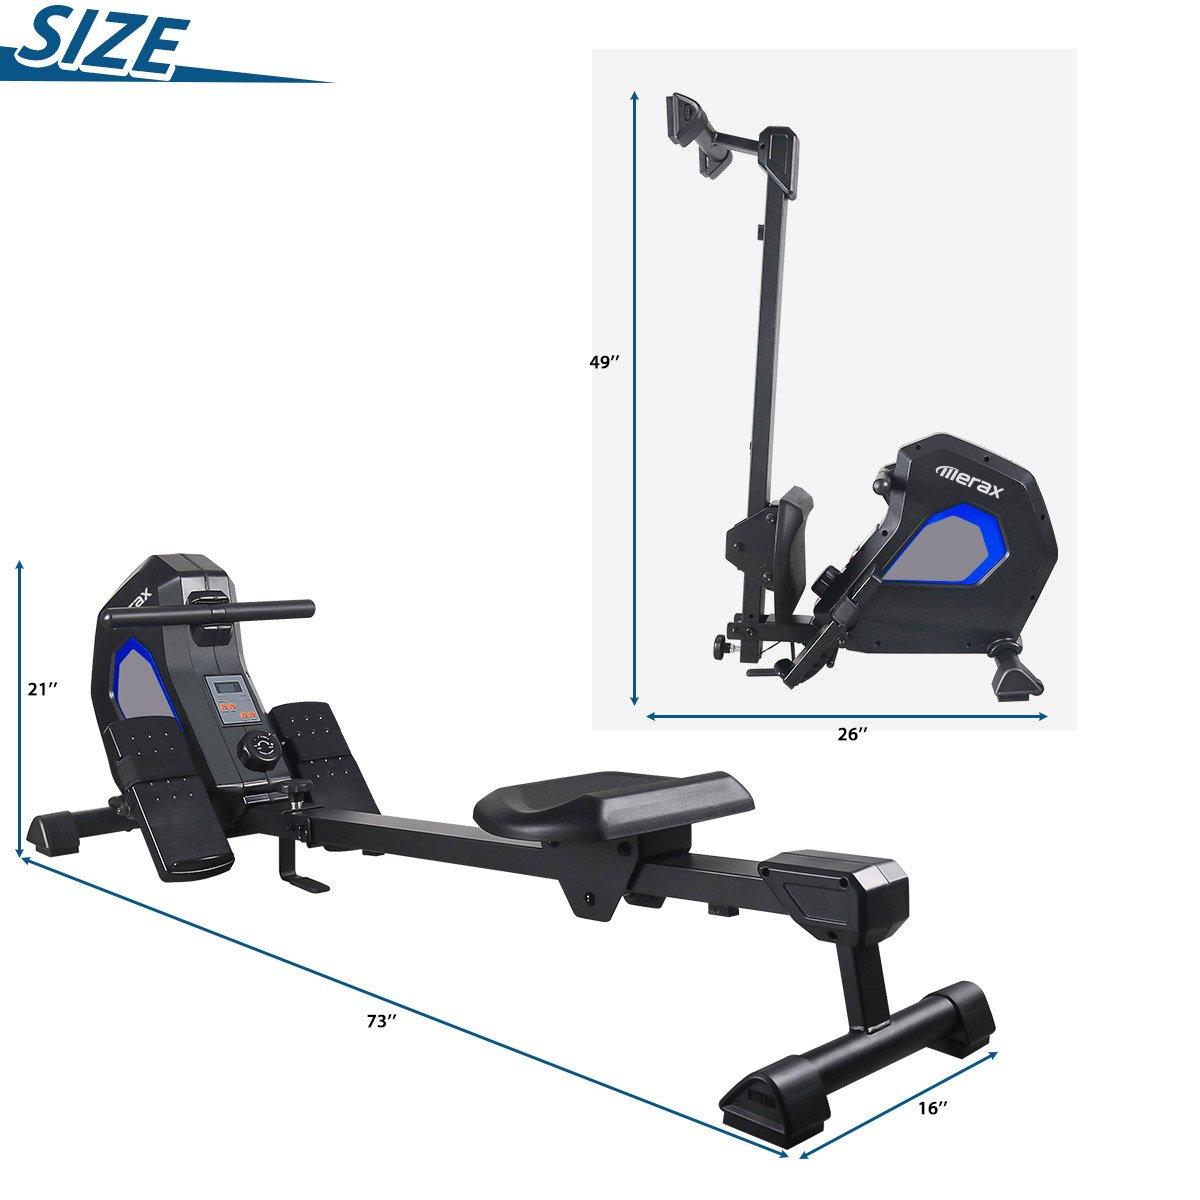 Merax Magnetic Exercise Rower Adjustable Resistance Rowing Machine (BK) by Merax (Image #6)